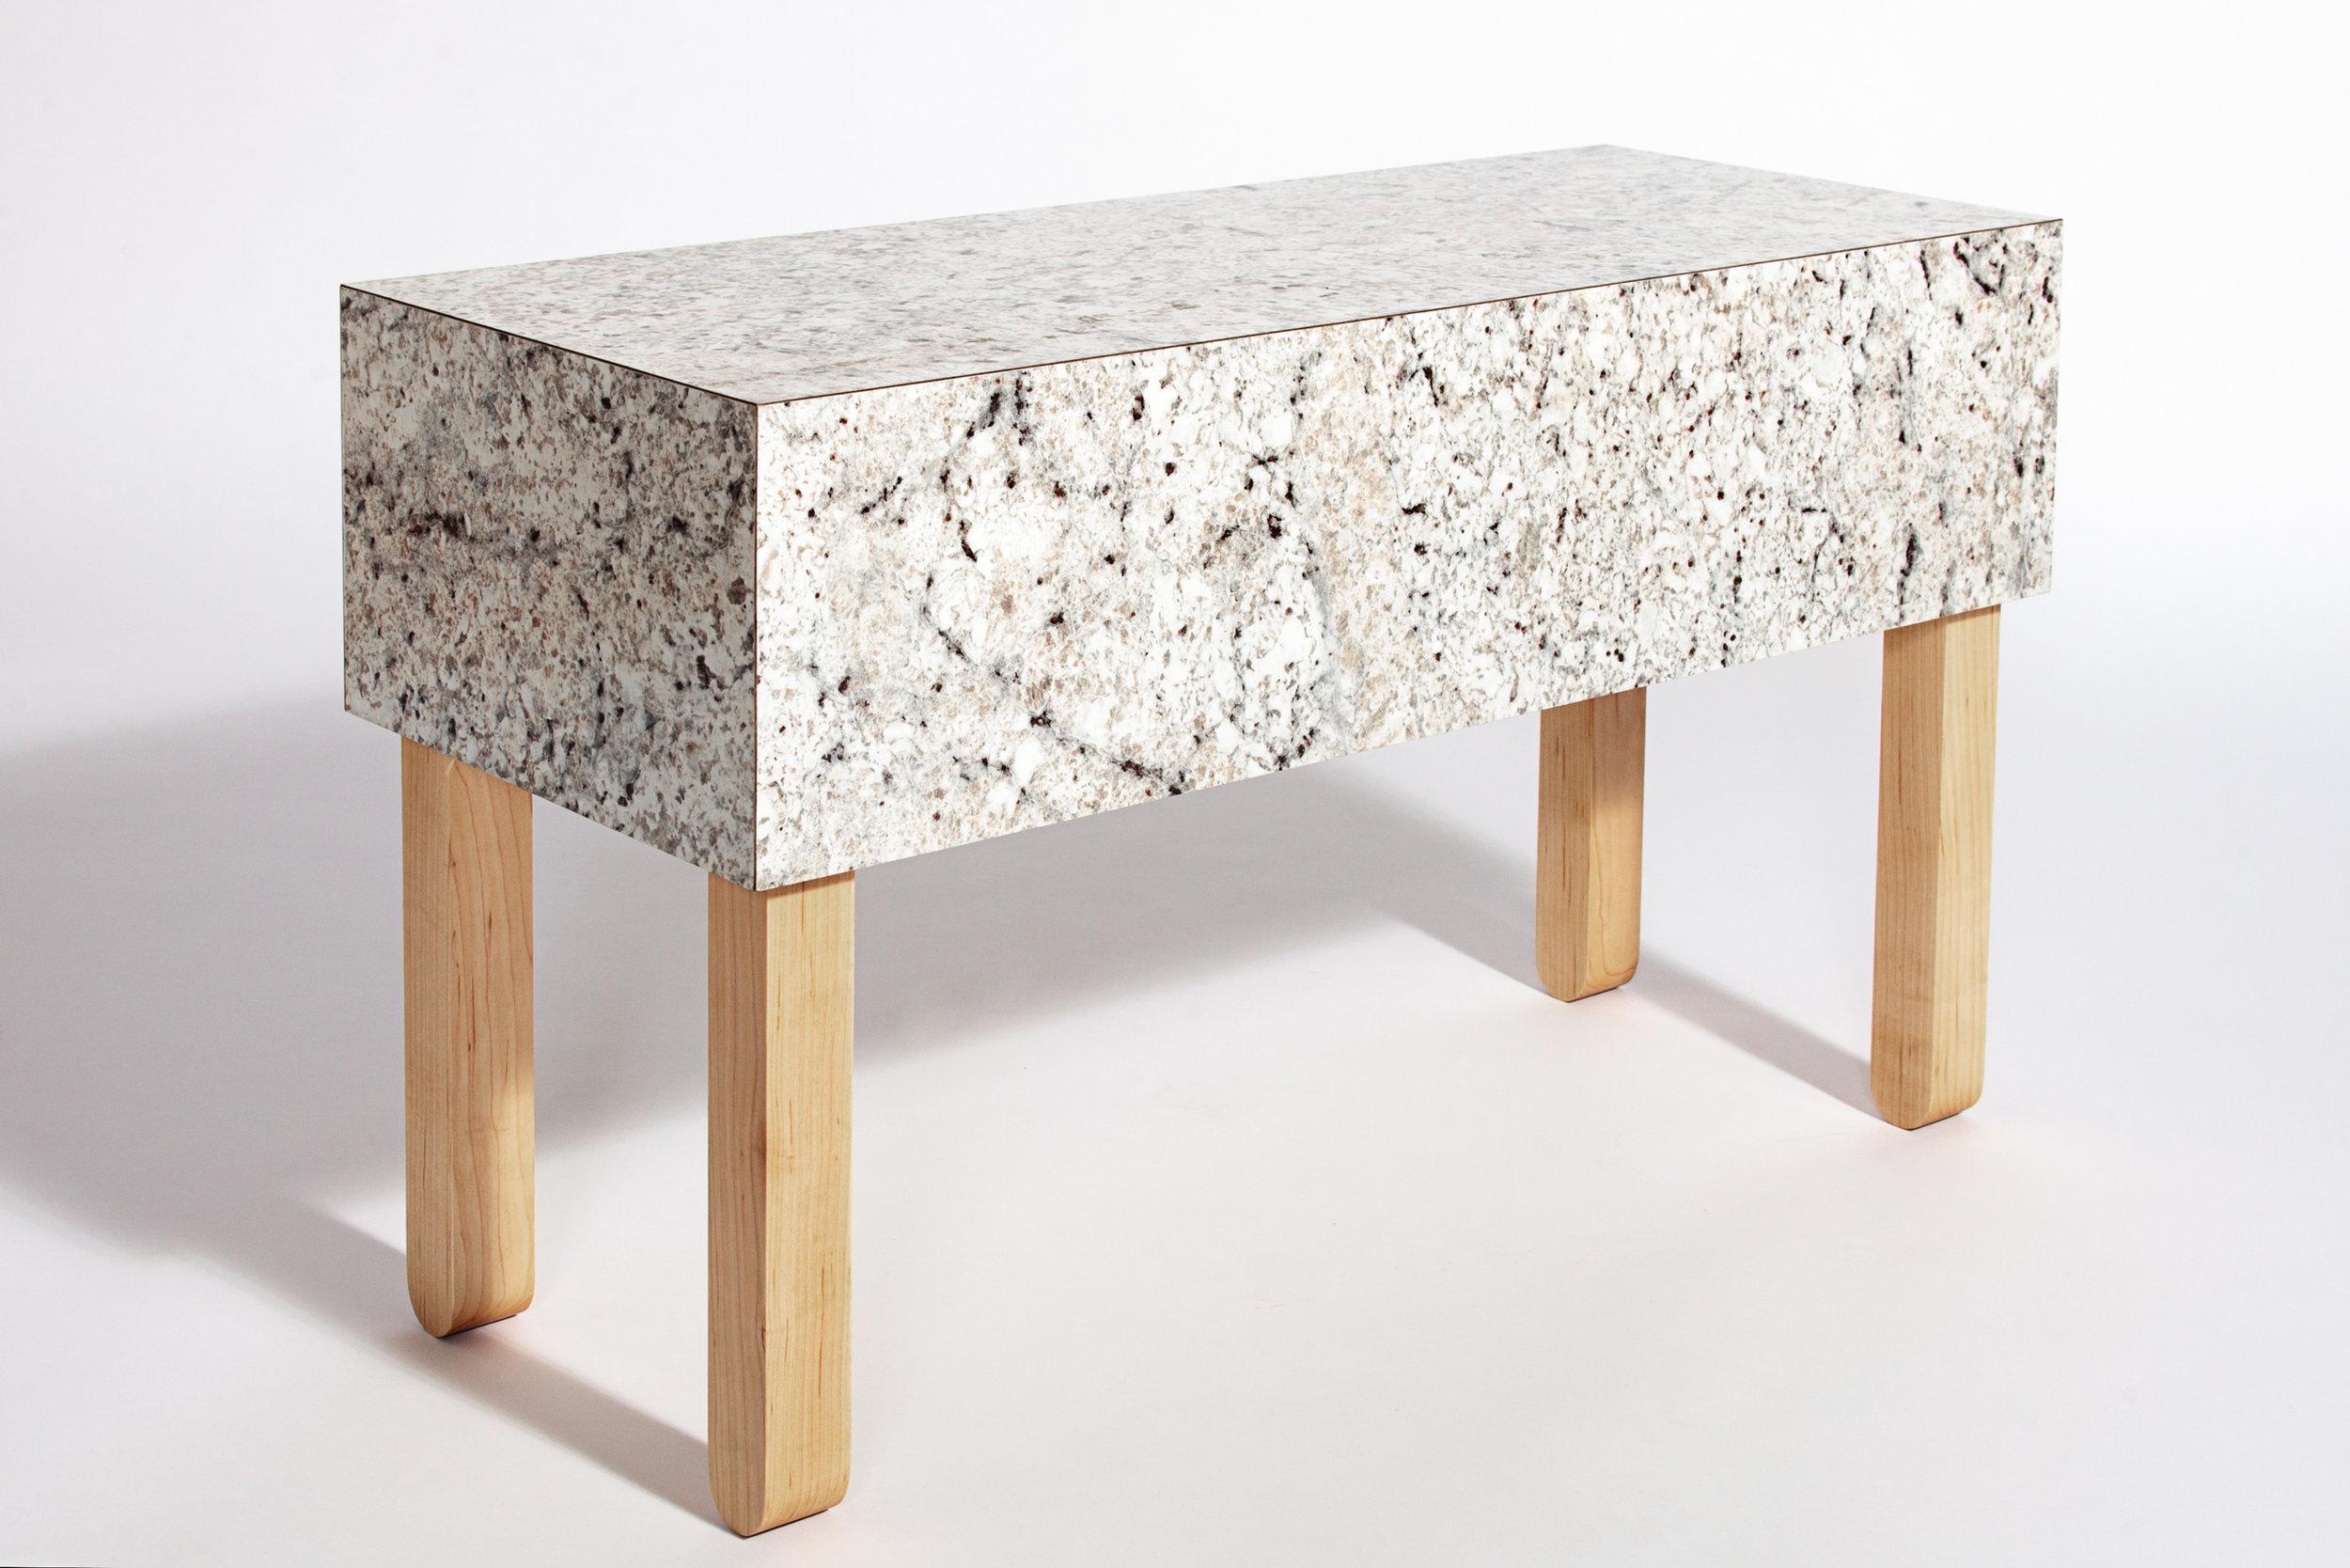 Table_v1.jpg